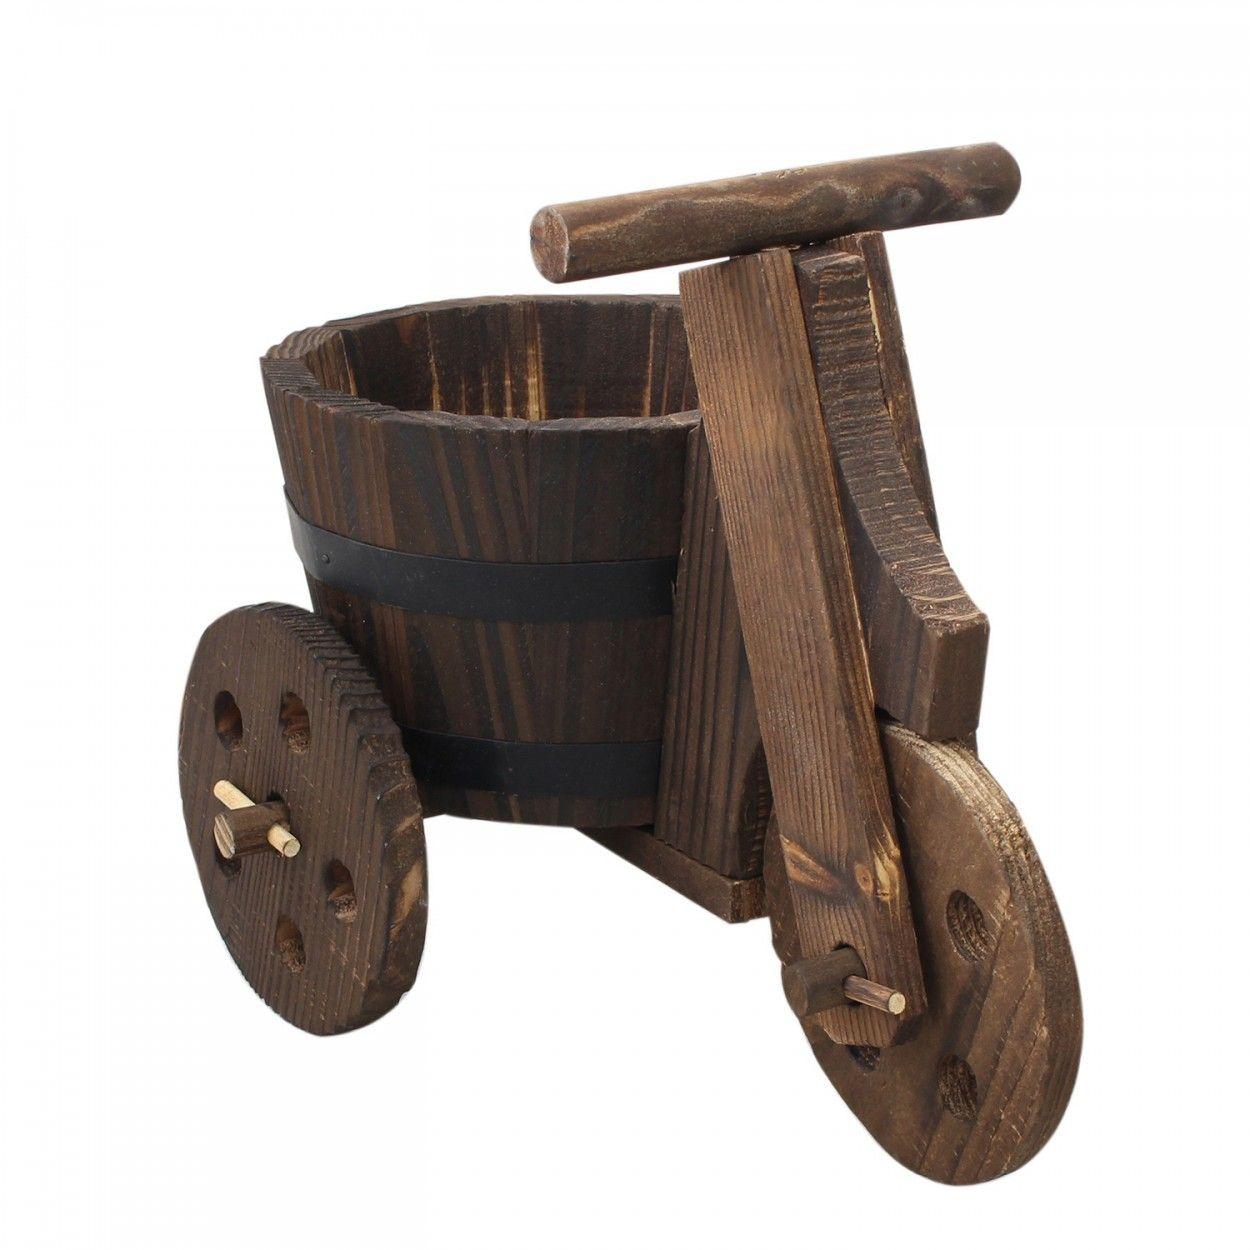 Comprar bicicleta maceta para jard n hogar y m s - Hogar y jardin castellon ...